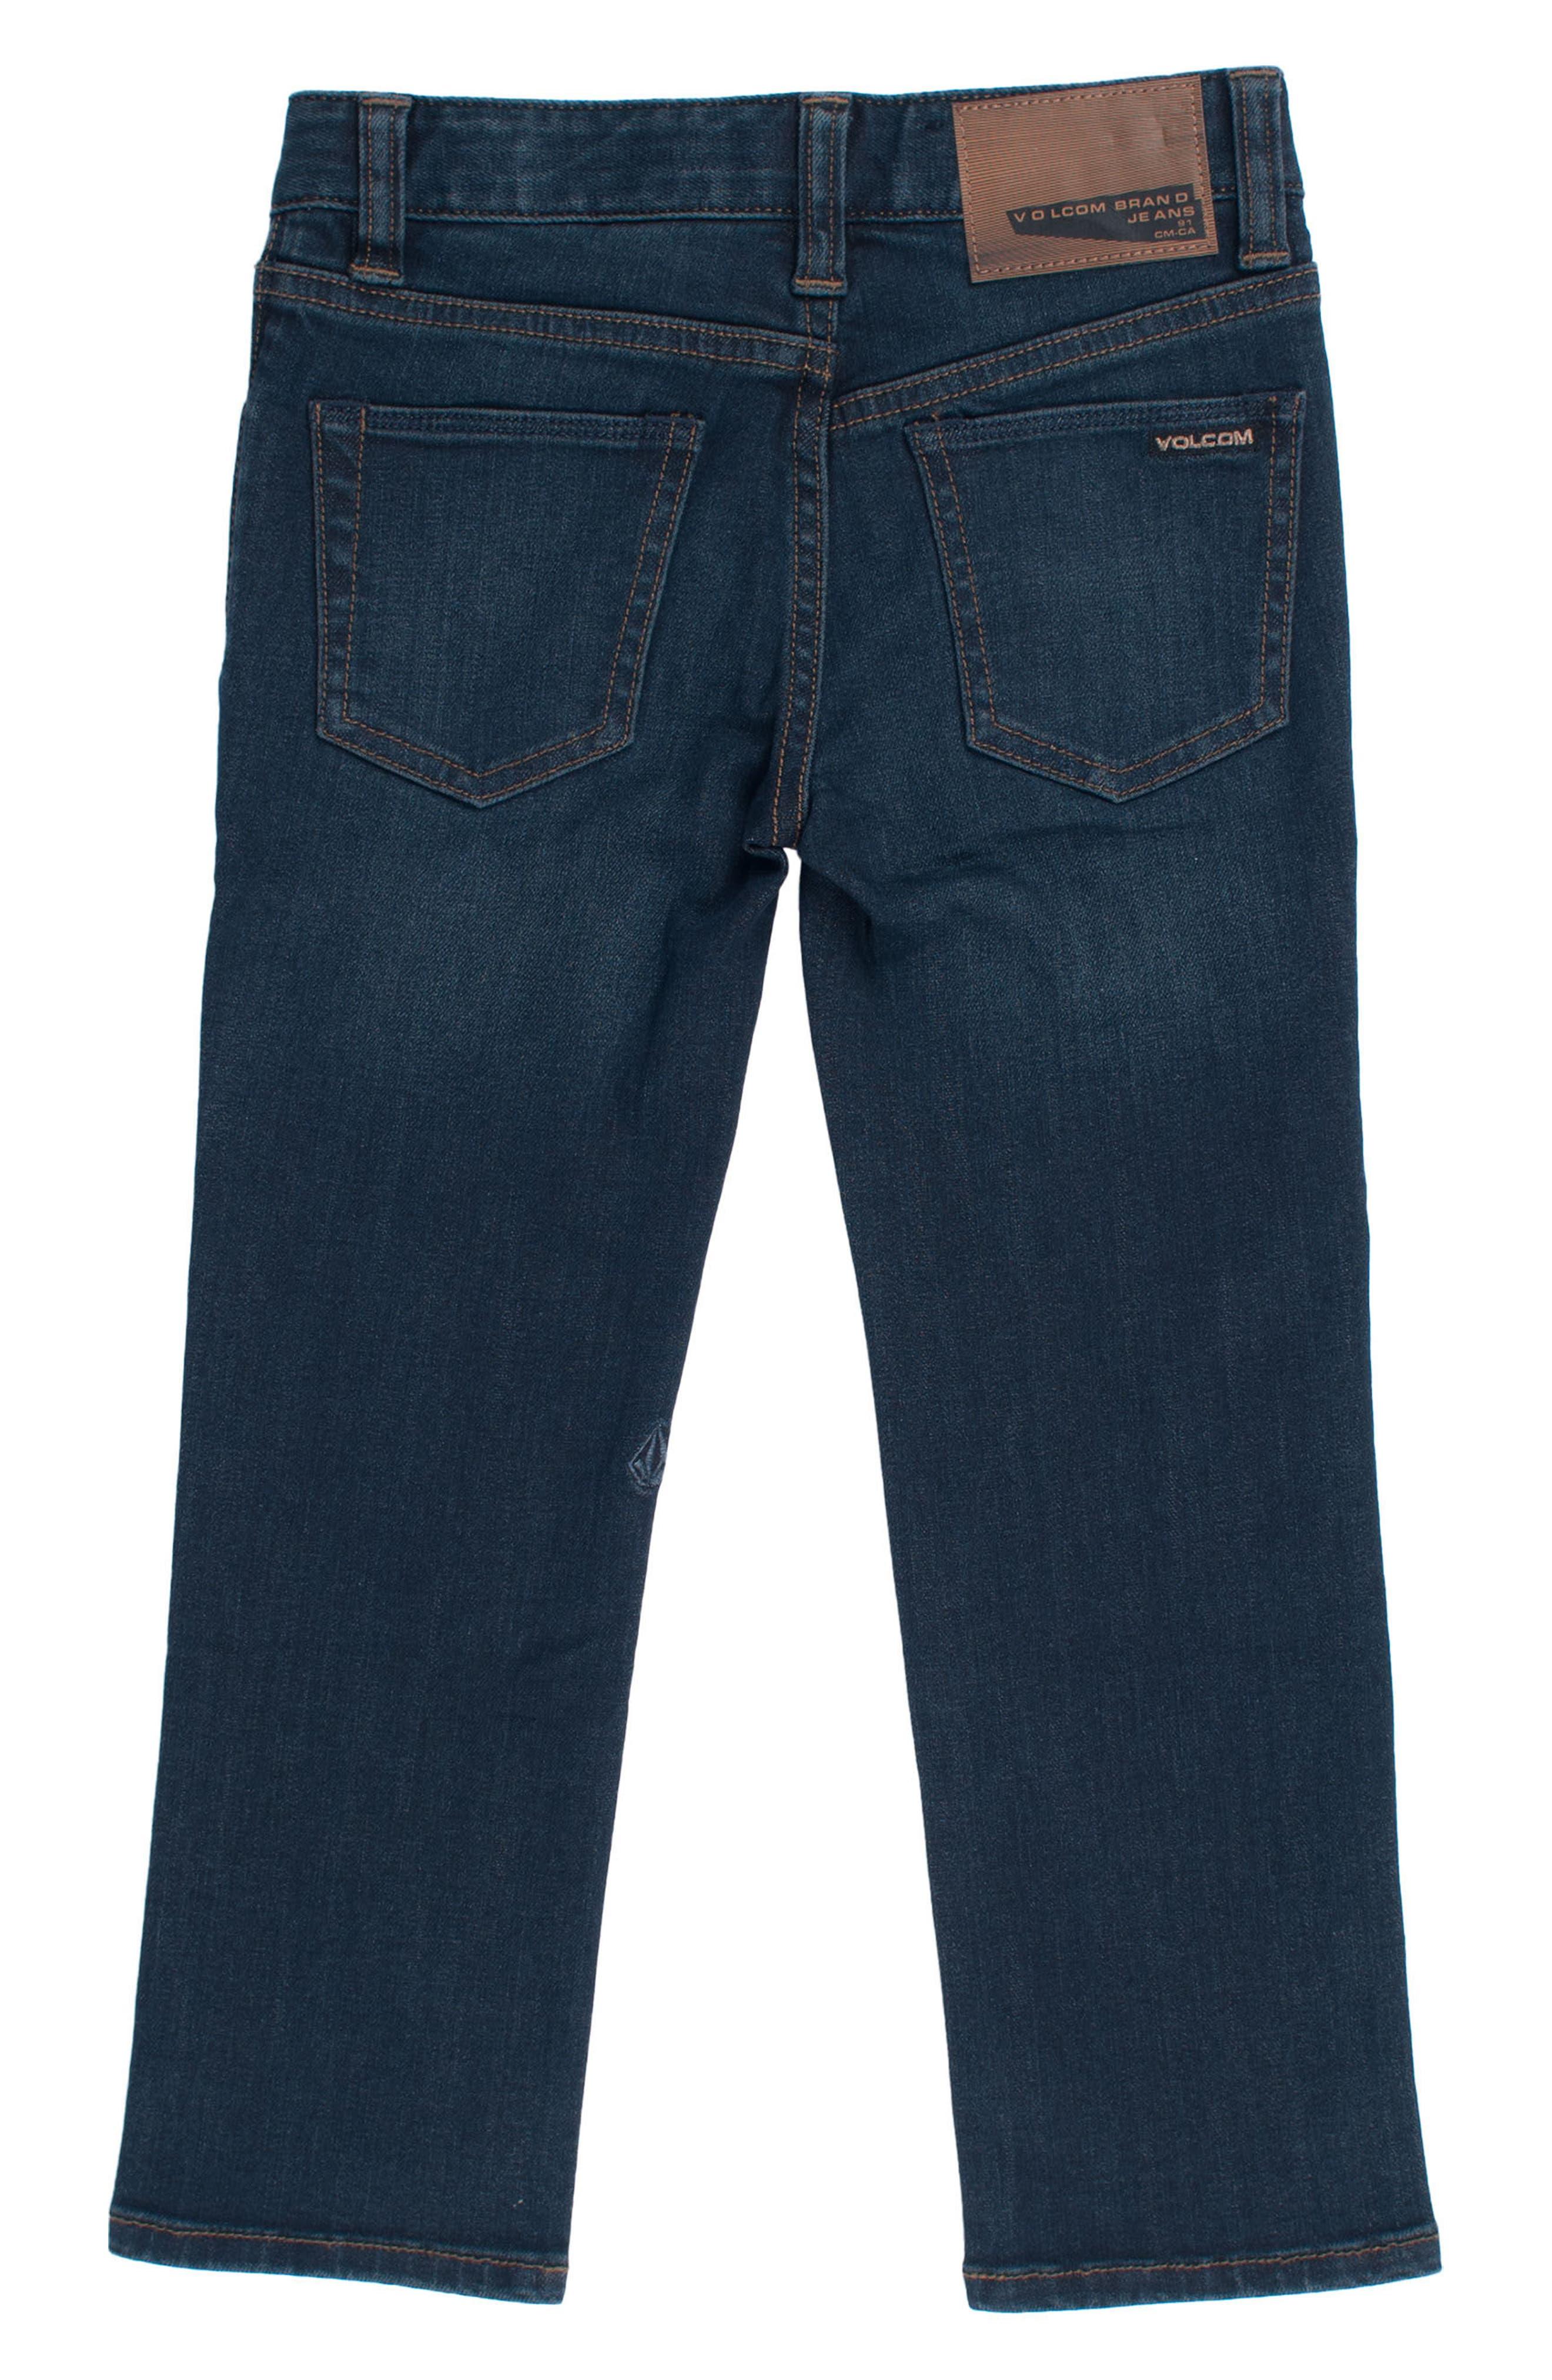 Vorta Slim Fit Jeans,                             Alternate thumbnail 2, color,                             Blue Rinser